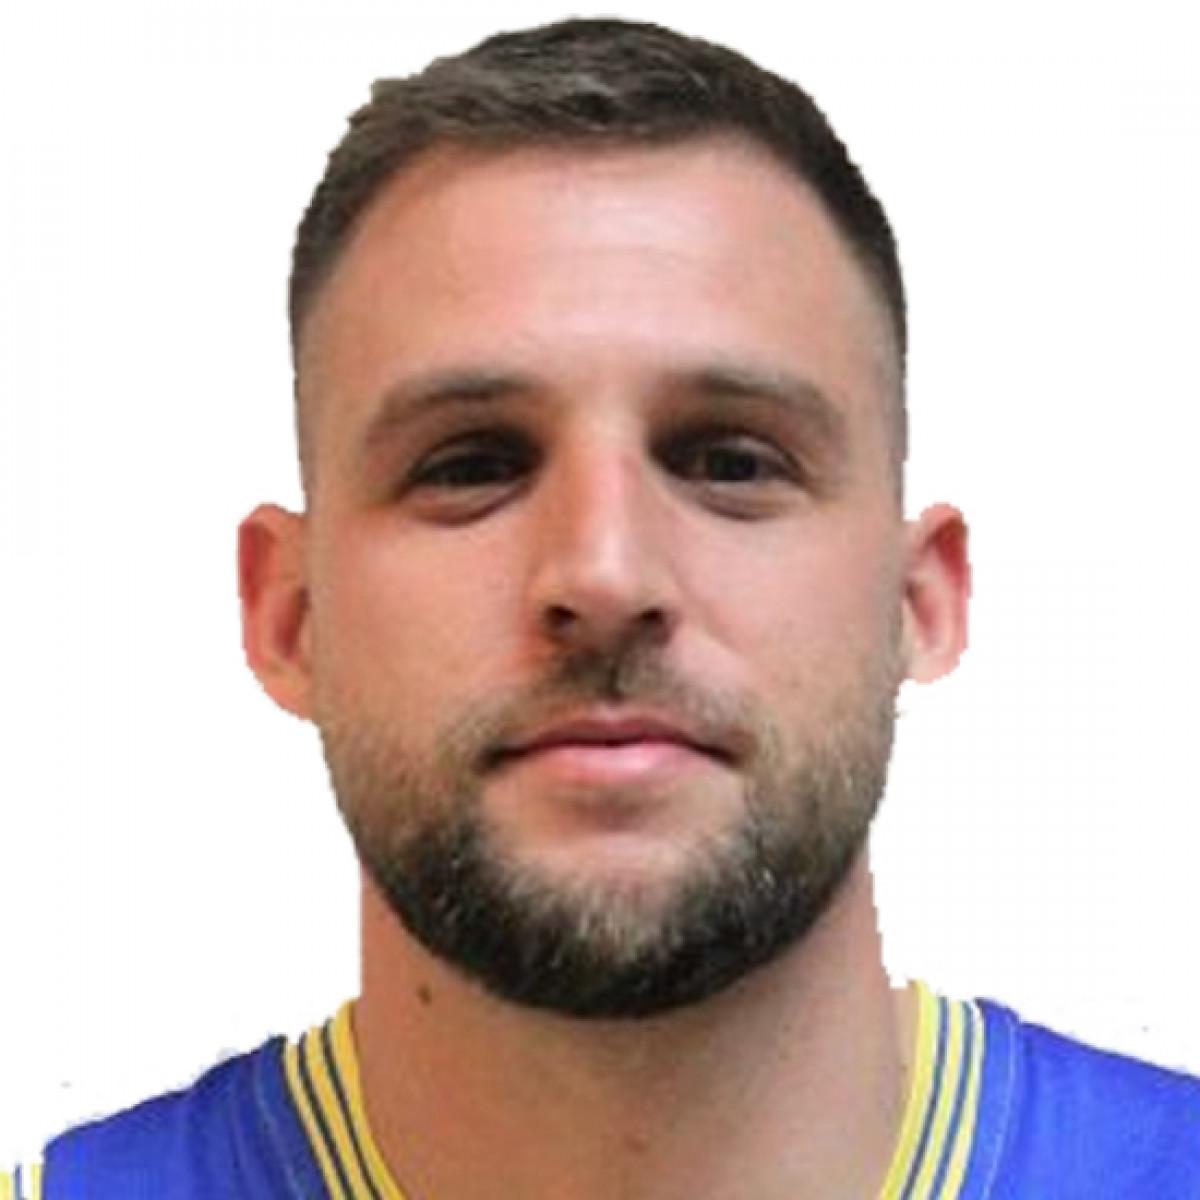 Marko Popadic